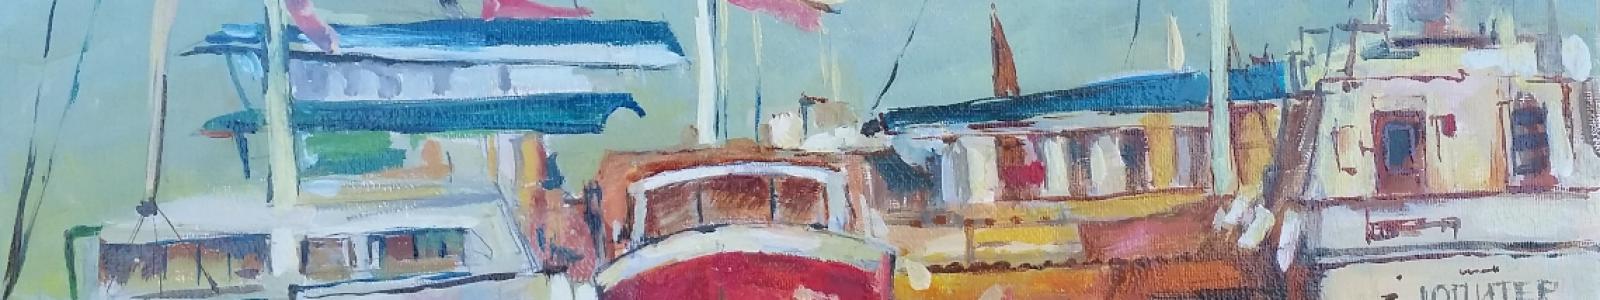 Gallery Painter Olga Zagvozdina